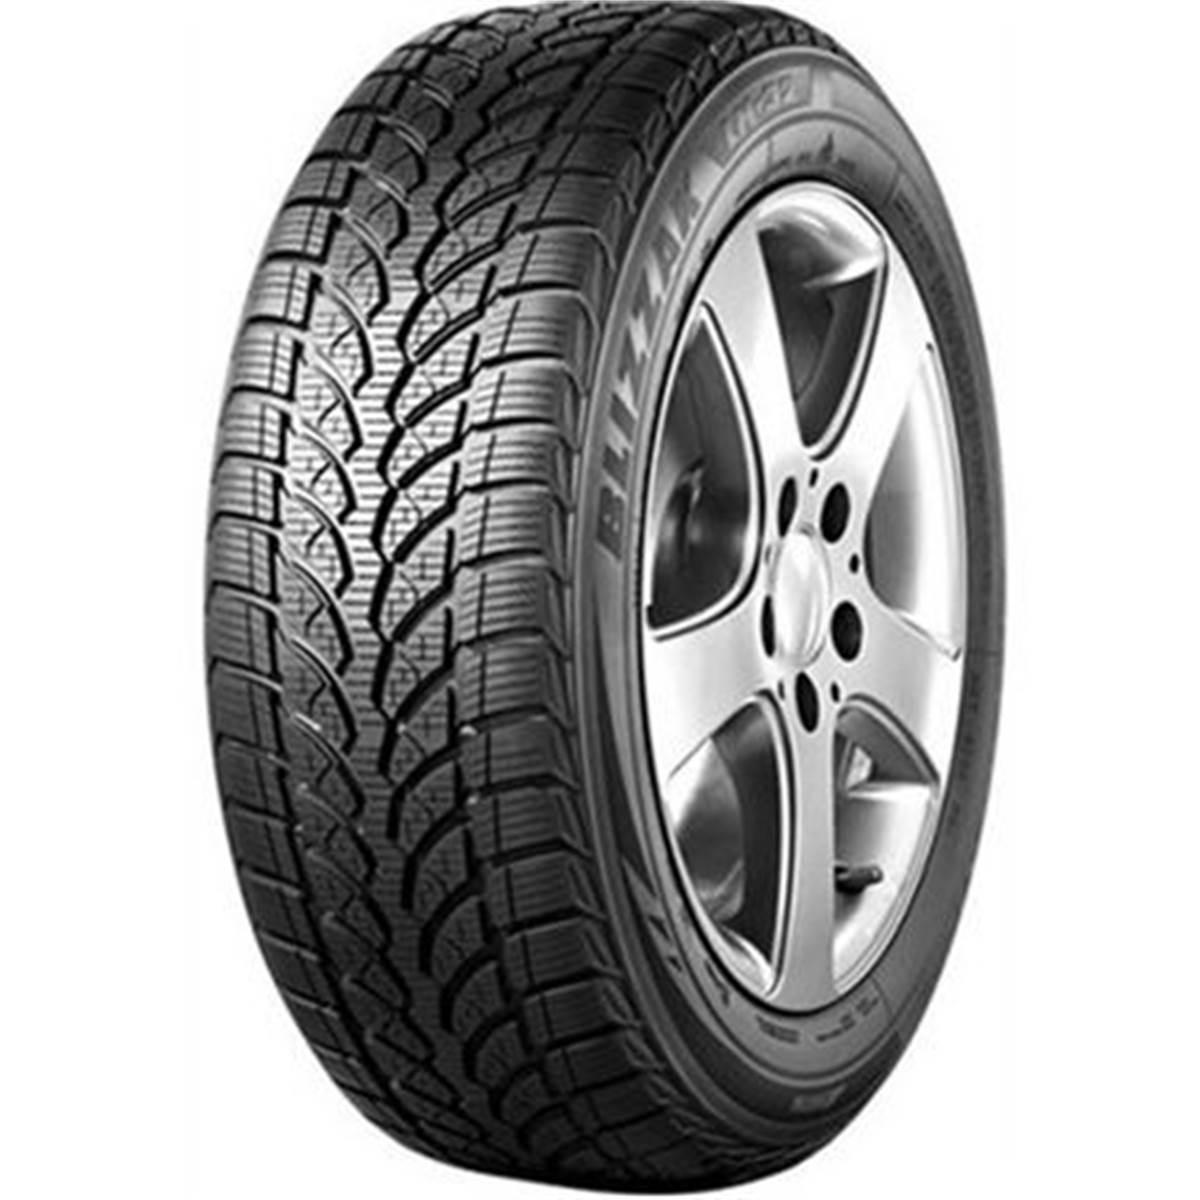 Pneu Hiver Bridgestone 185/60R15 88T Blizzak Lm32 XL